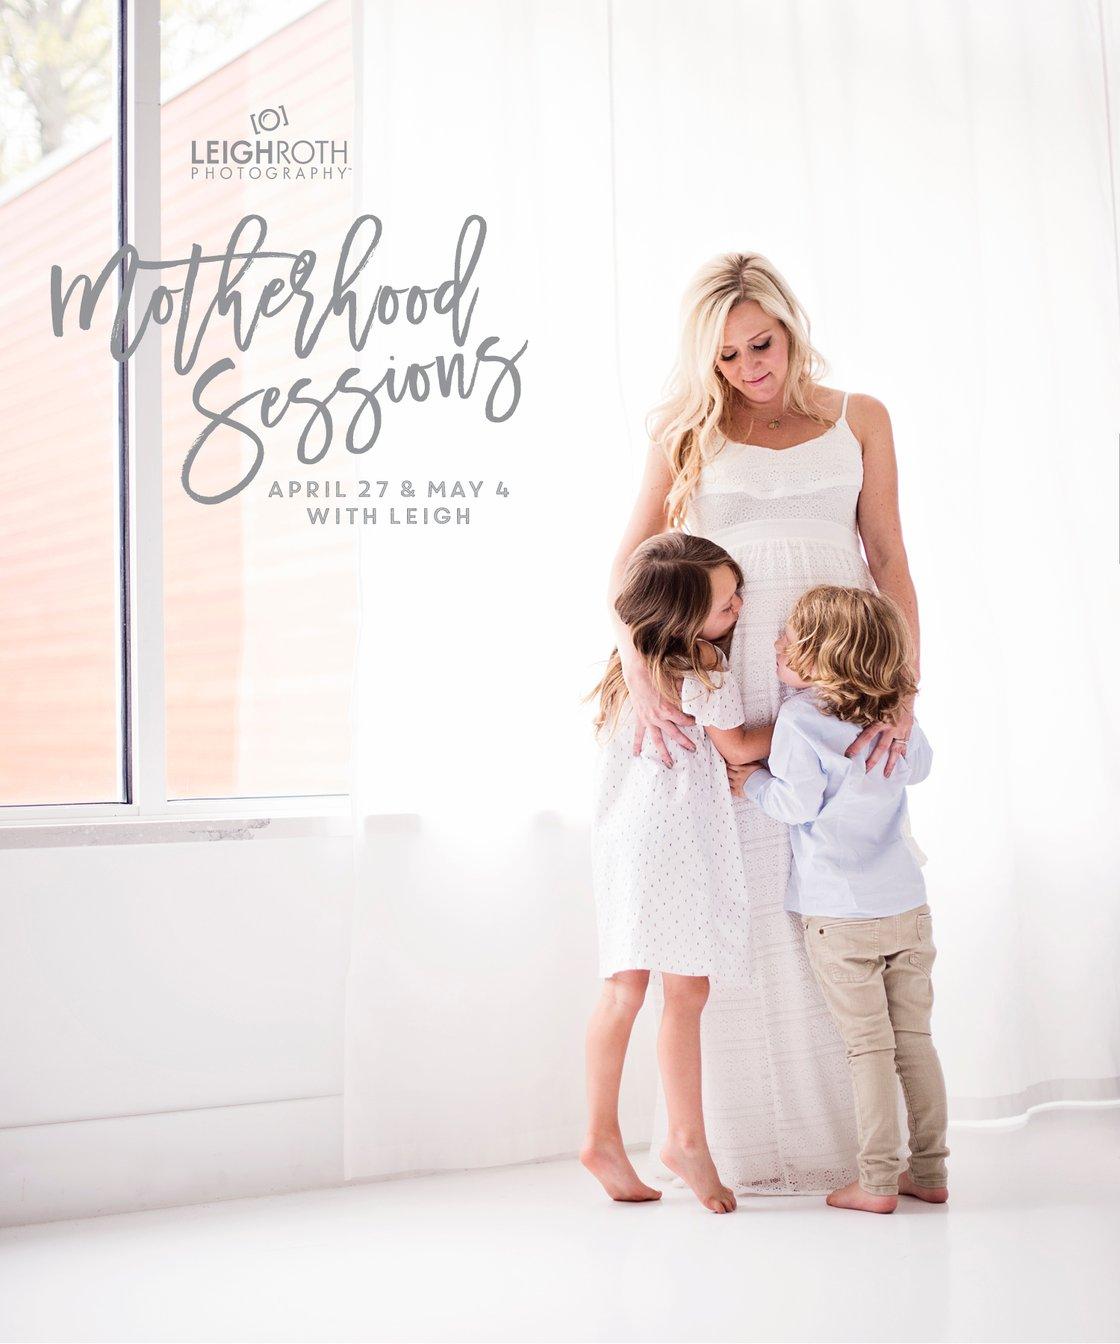 Image of 2019 Motherhood Mini Sessions - SATURDAY MAY 4